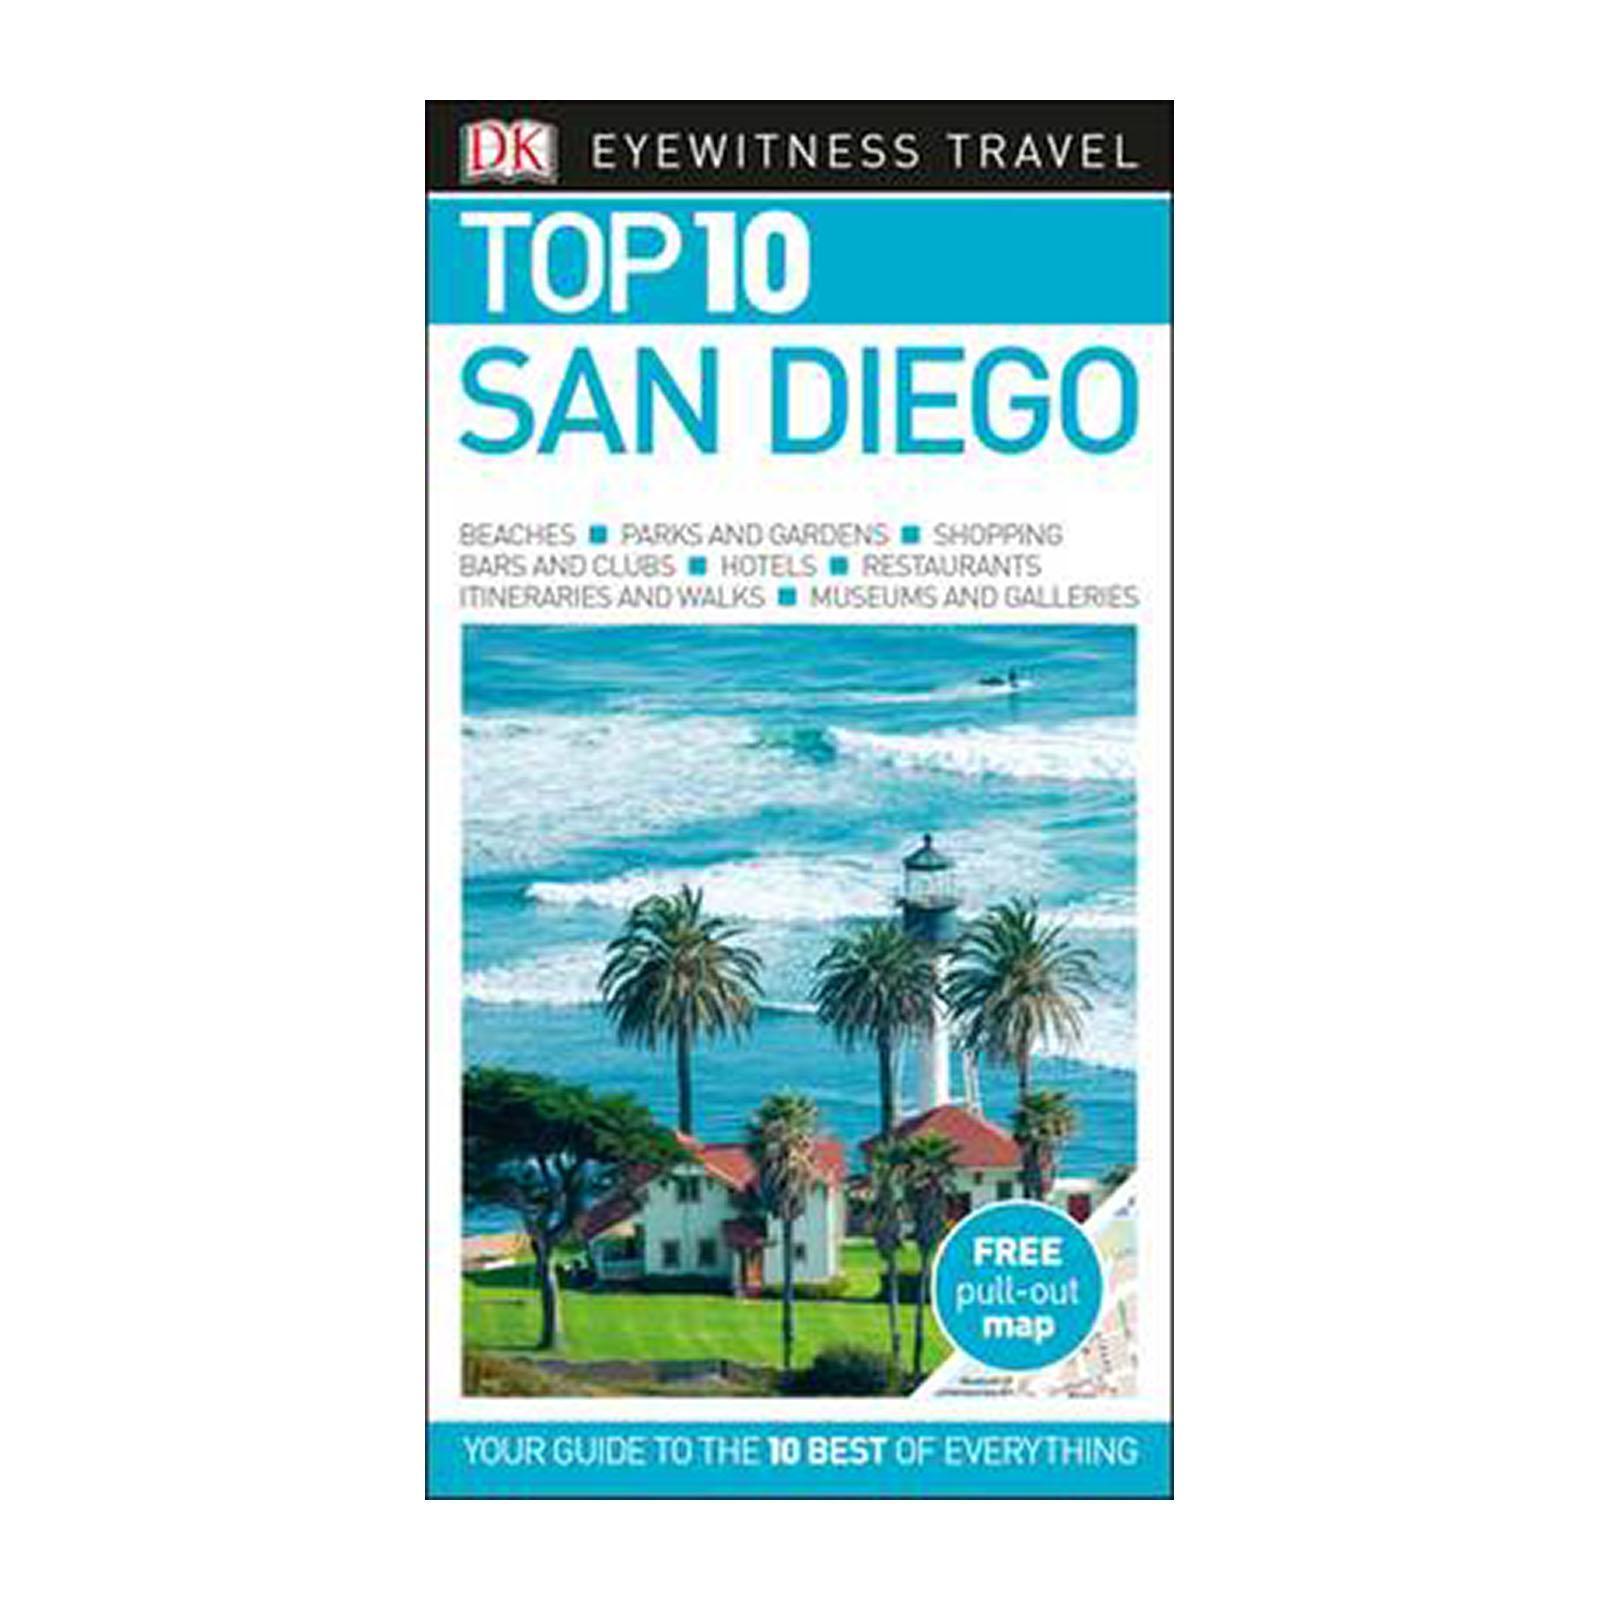 Top 10 San Diego (Paperback)